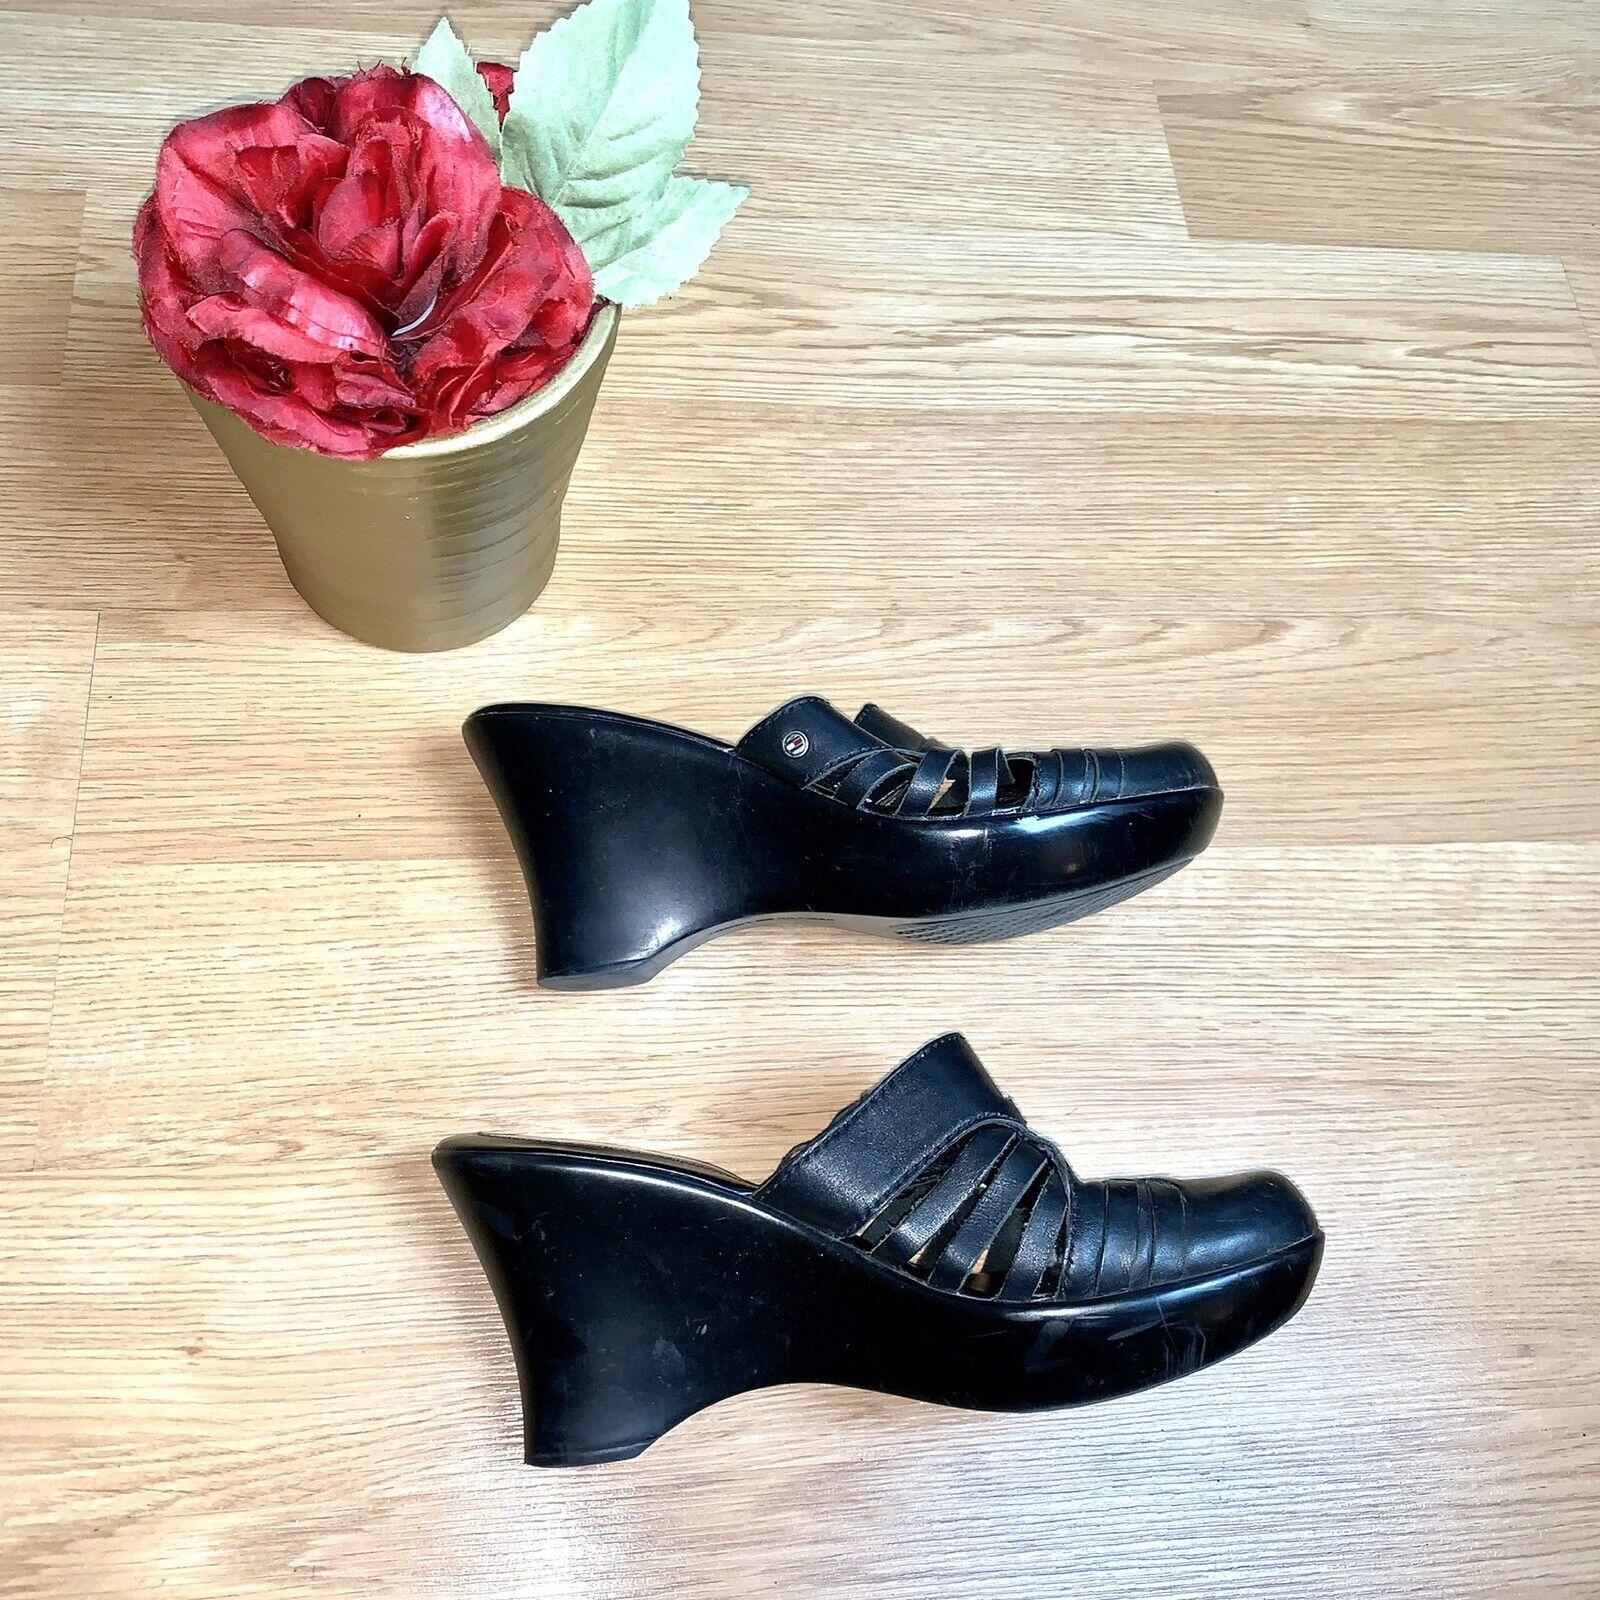 Tommy Hilfiger  Black Mule Leather Wedges Size 8 - image 2